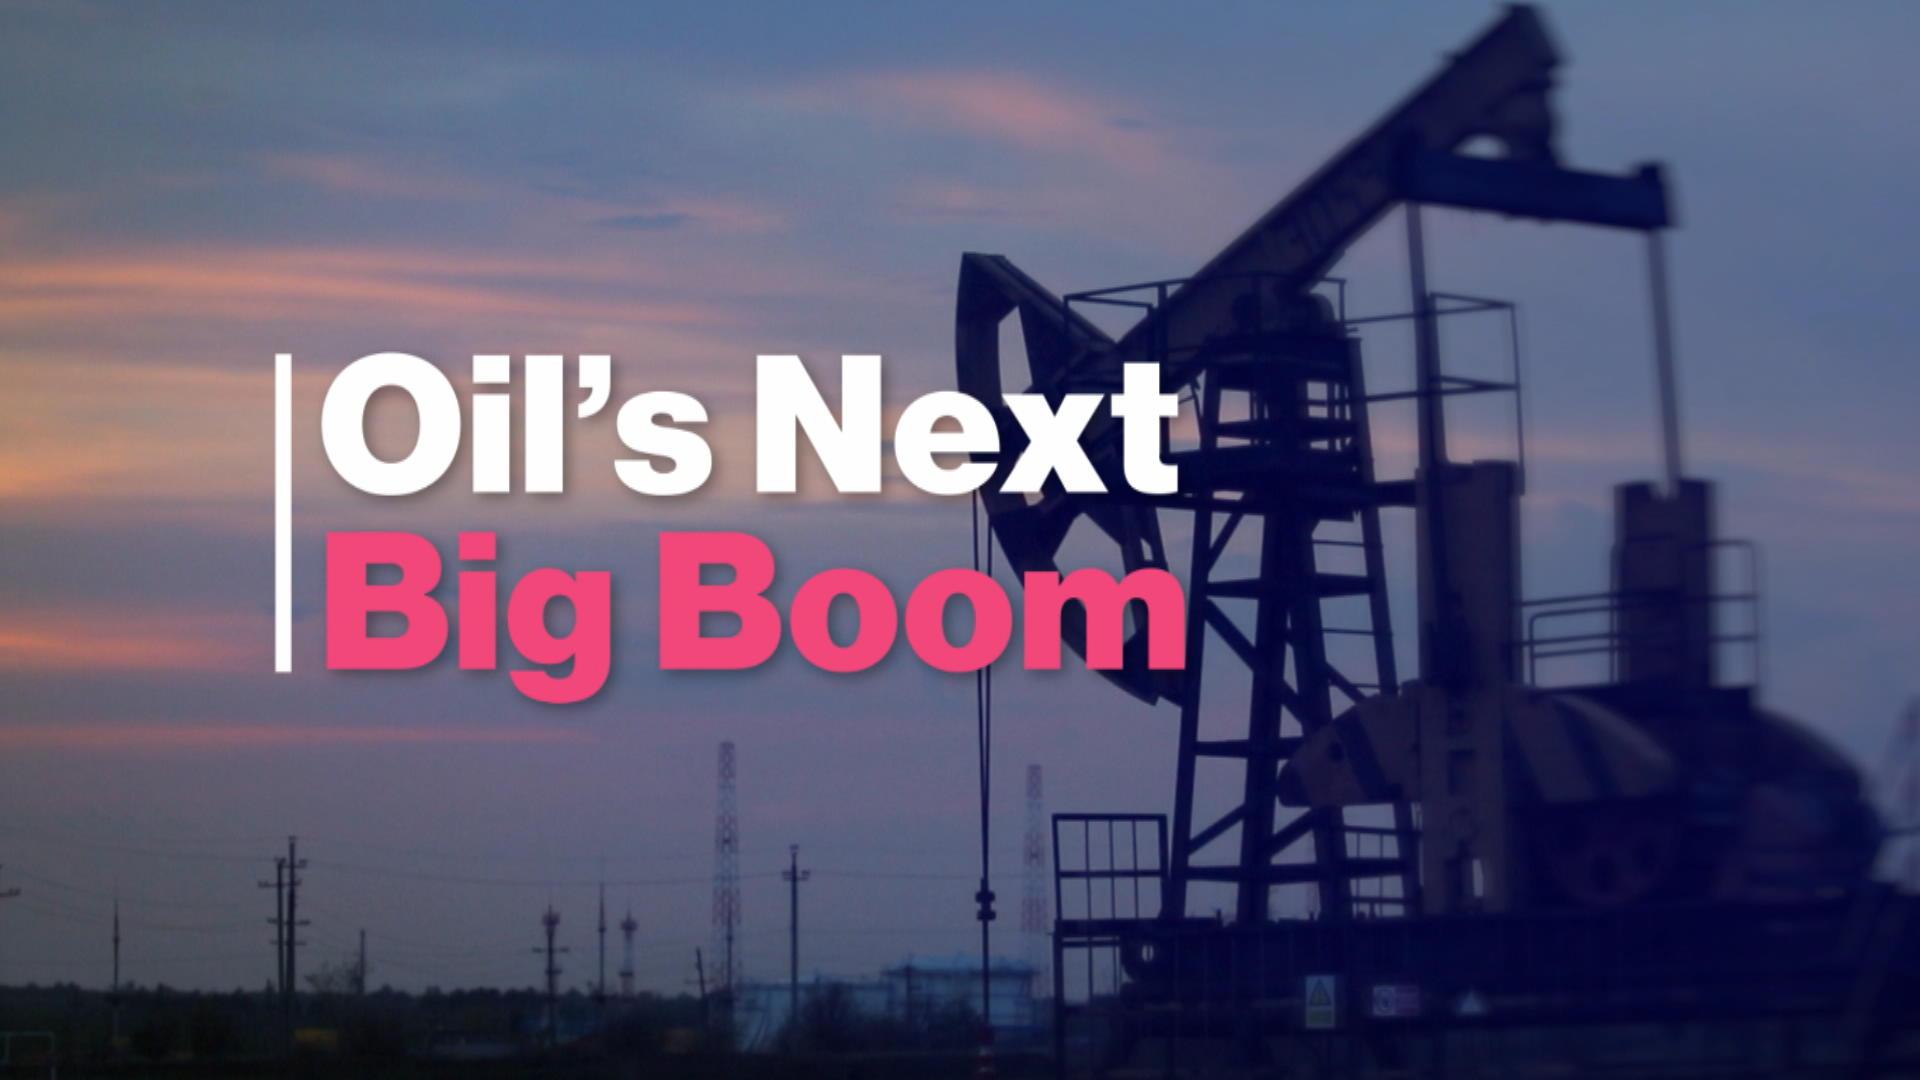 Bloomberg: Oil's Next Big Boom - Bloomberg